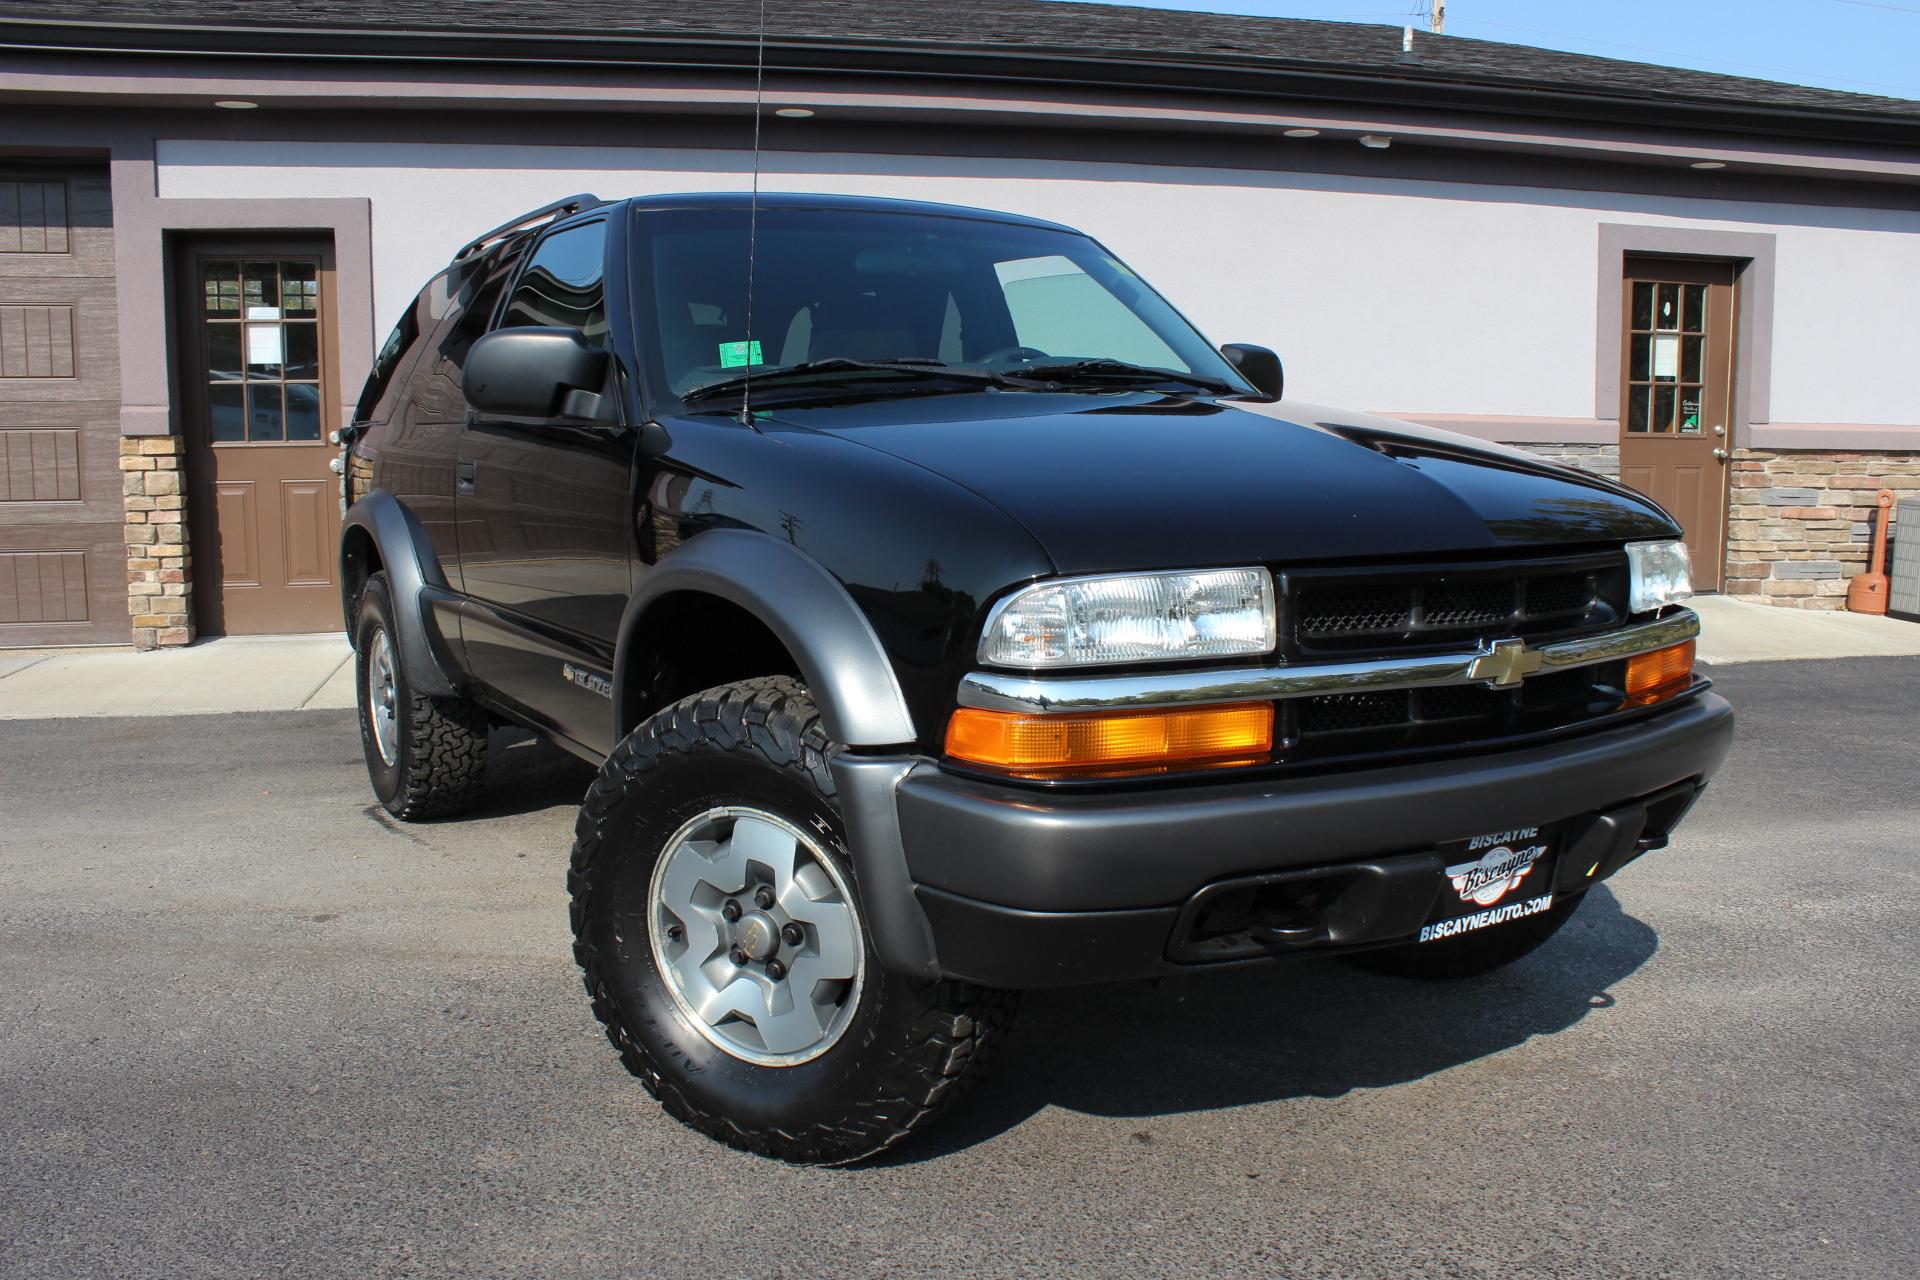 2002 chevrolet blazer ls zr2 biscayne auto sales pre owned dealership ontario ny 2002 chevrolet blazer ls zr2 biscayne